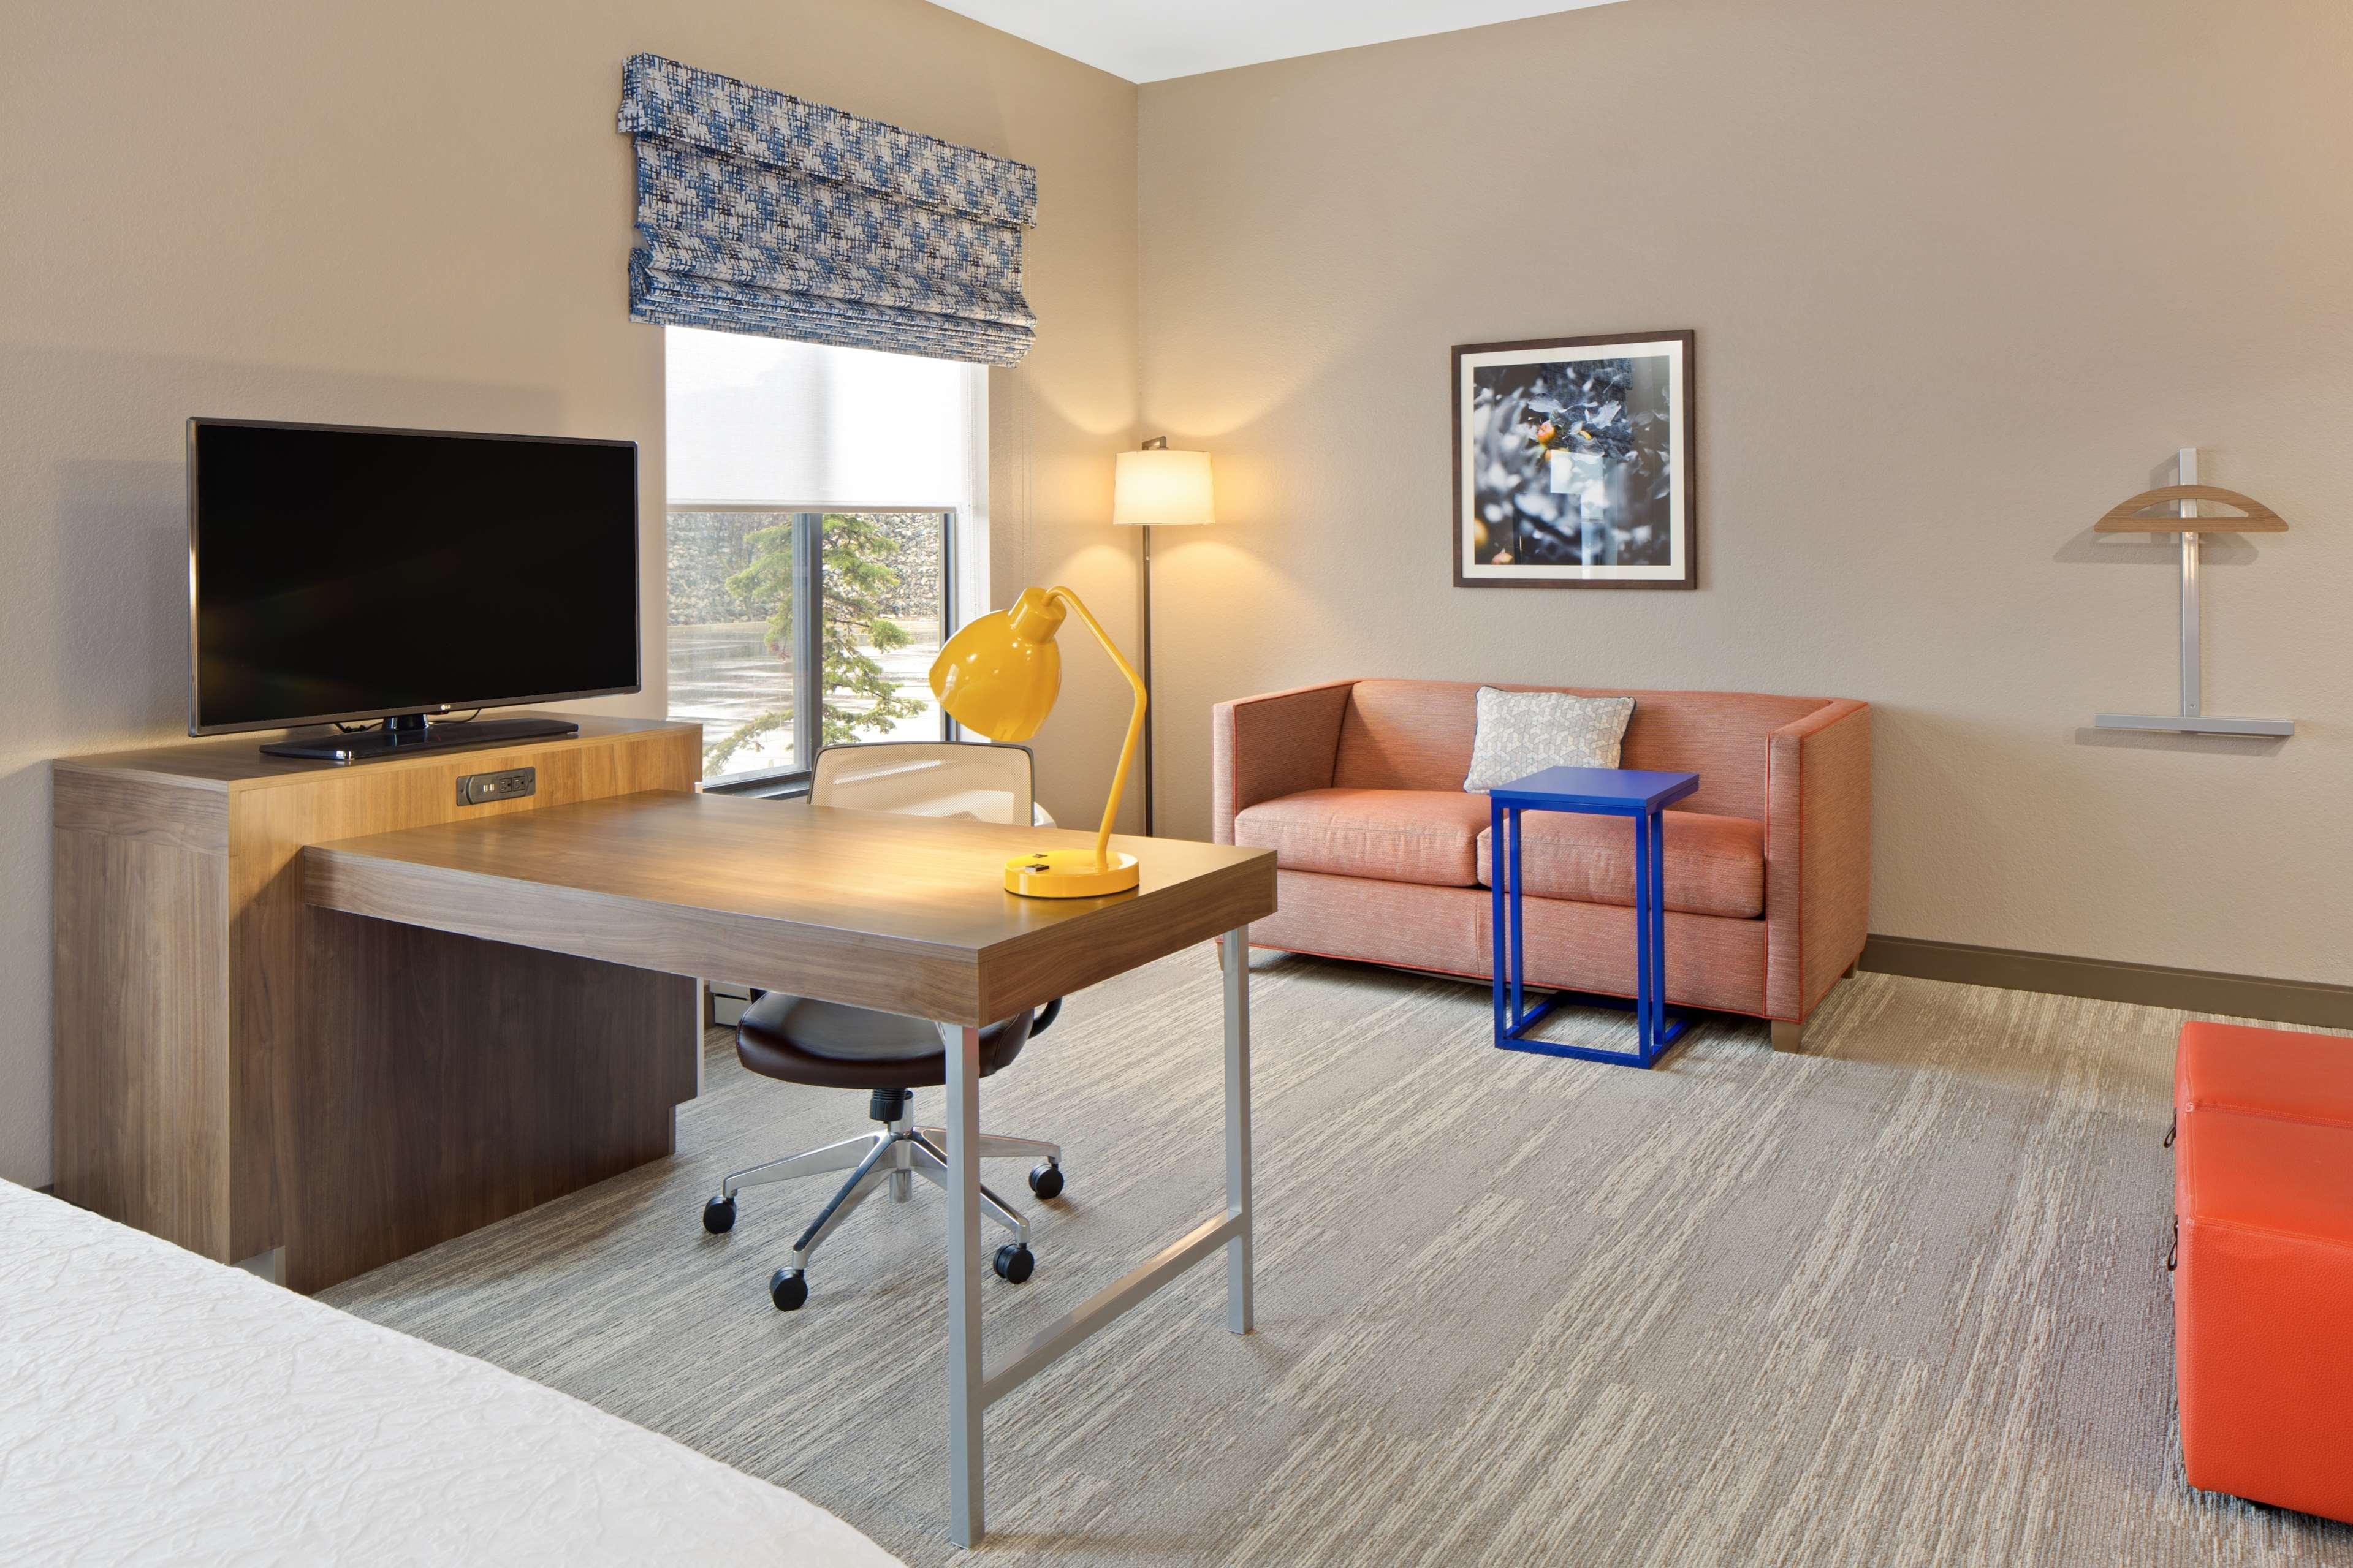 Hampton Inn & Suites Spokane Valley image 17